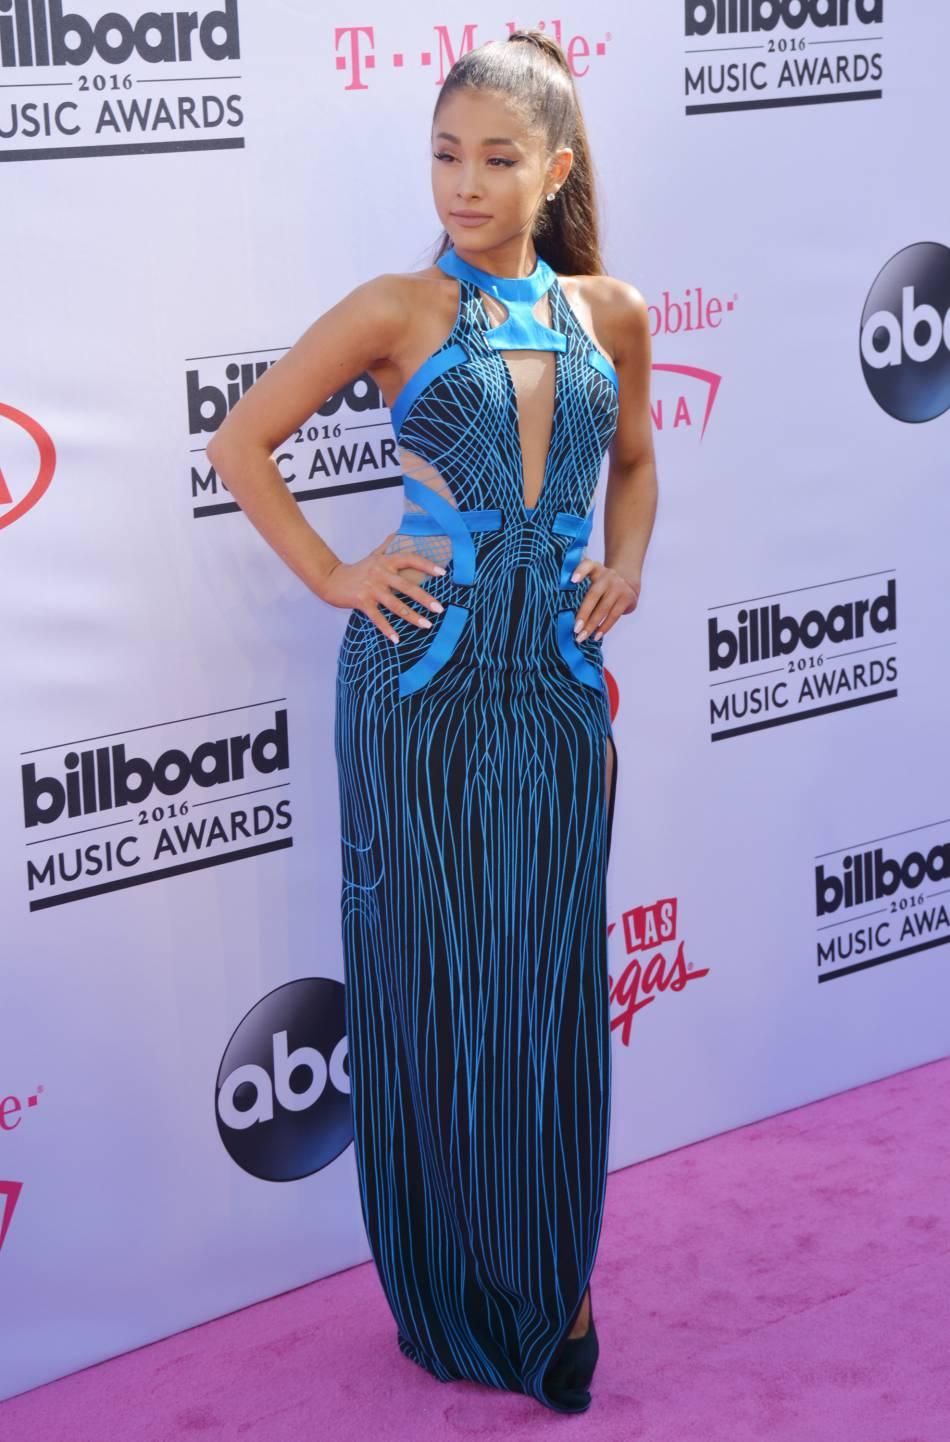 La chanteuse Ariana Grande portait une robe bleue signée Versace.